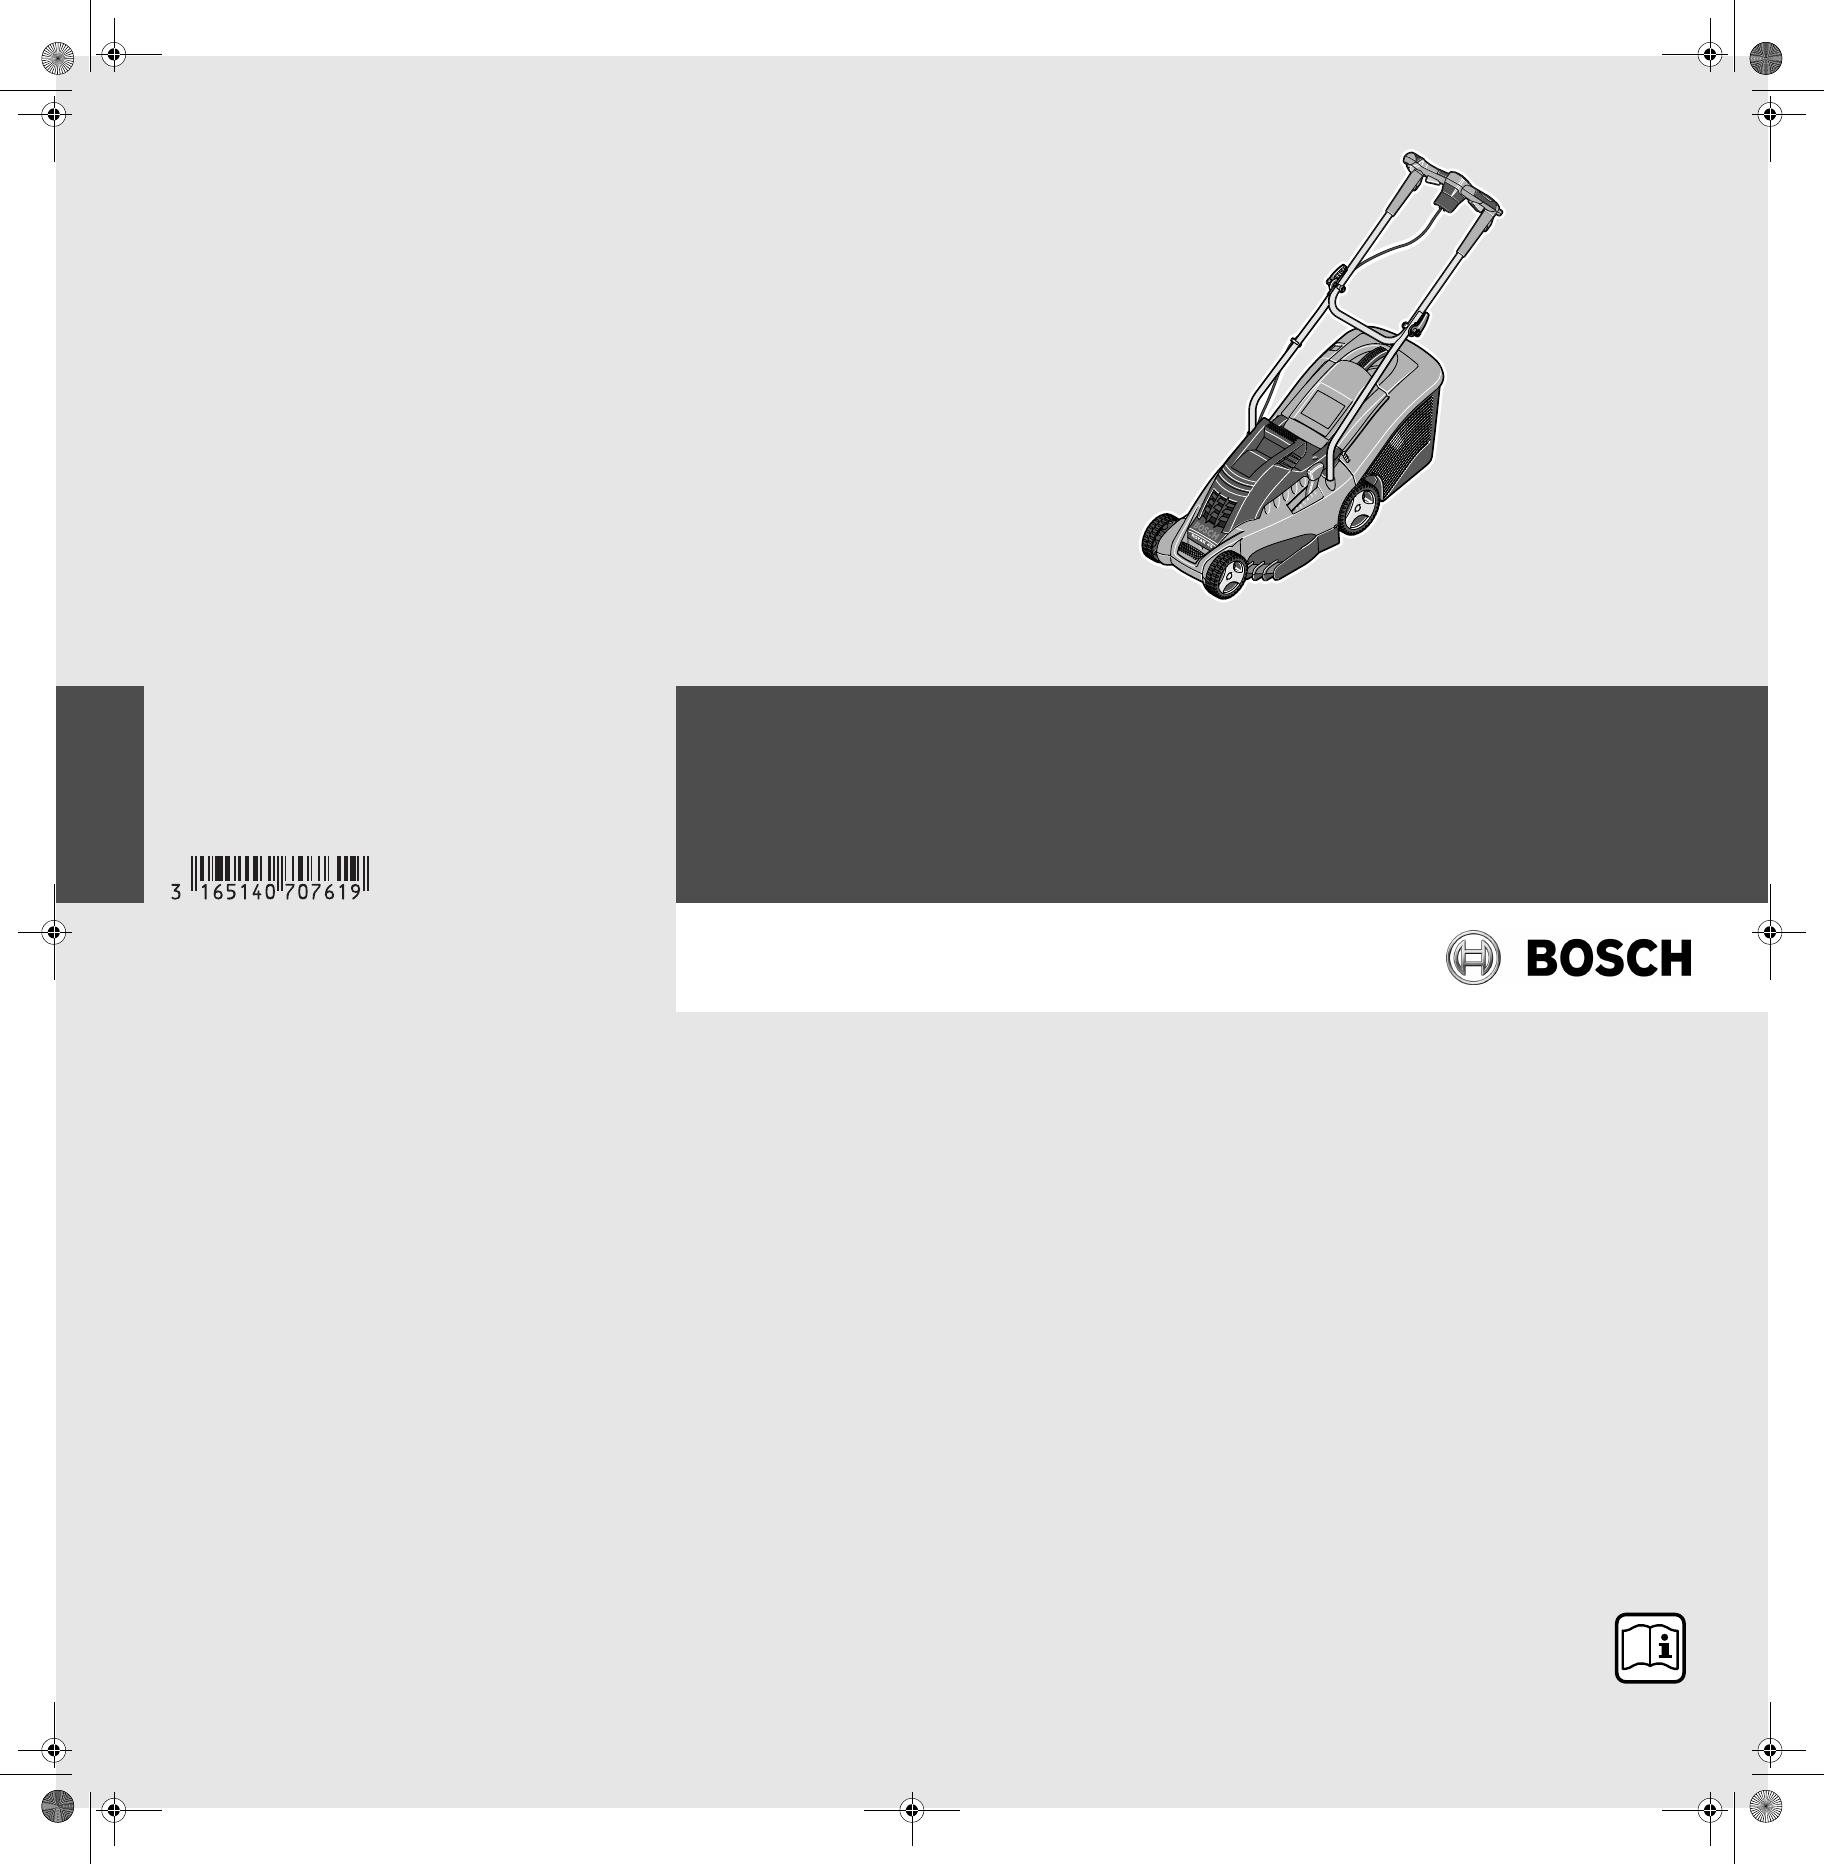 Bosch Rotak 43 0600881300